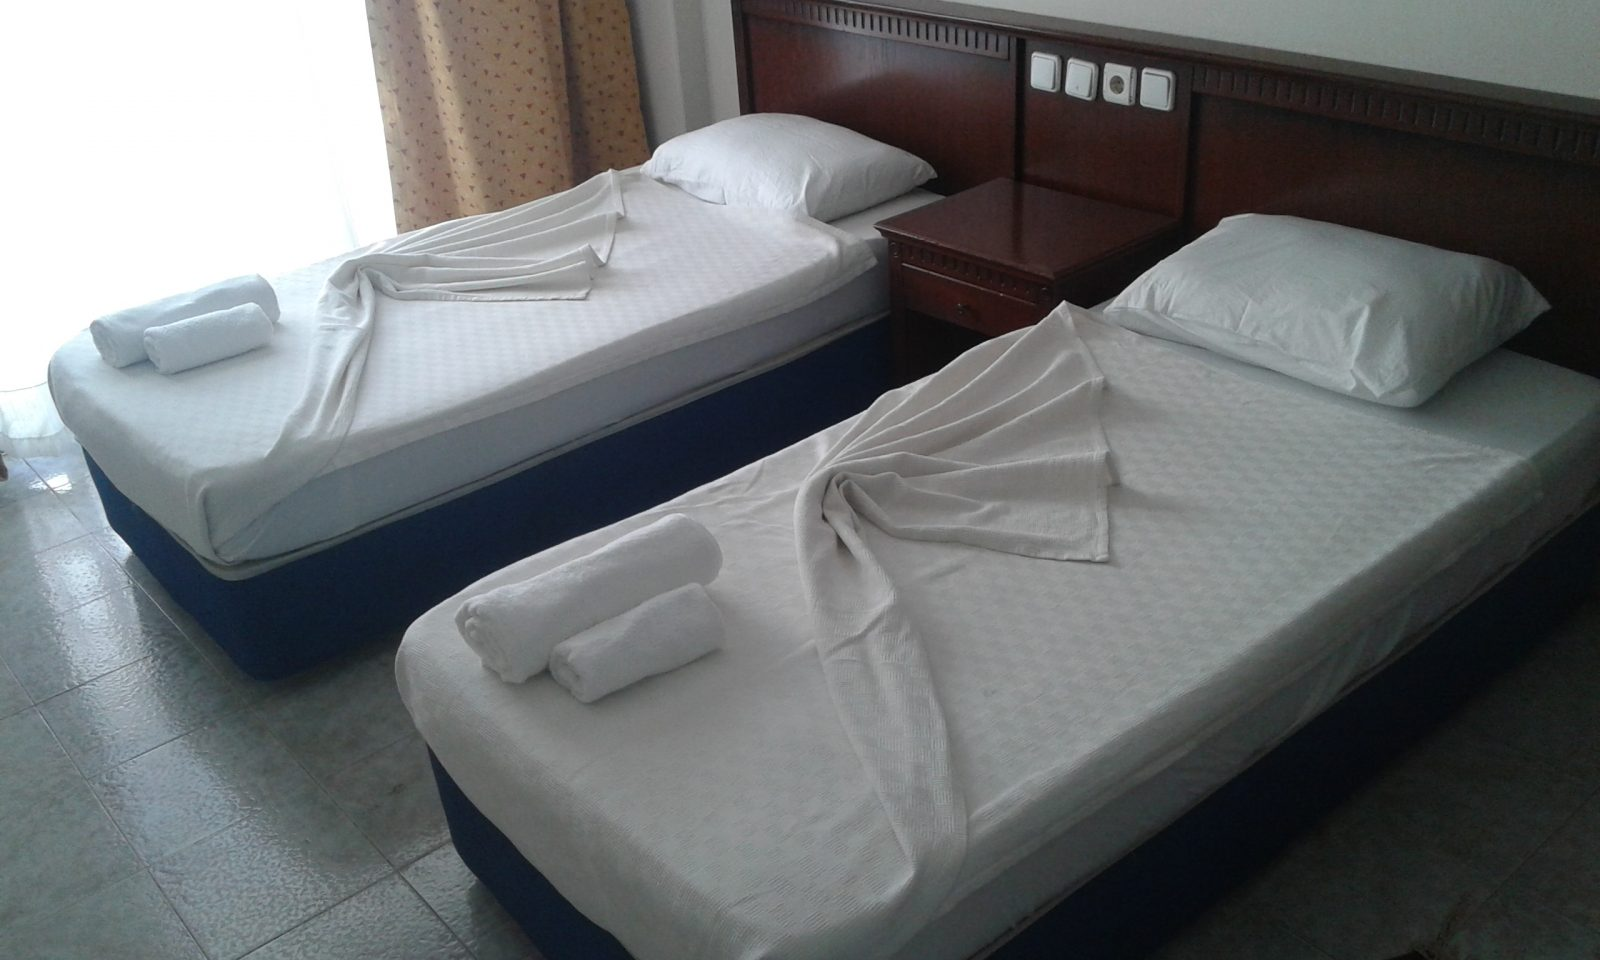 Letovanje Turska autobusom, Kusadasi, Hotel Tecimen,pogled na sobu